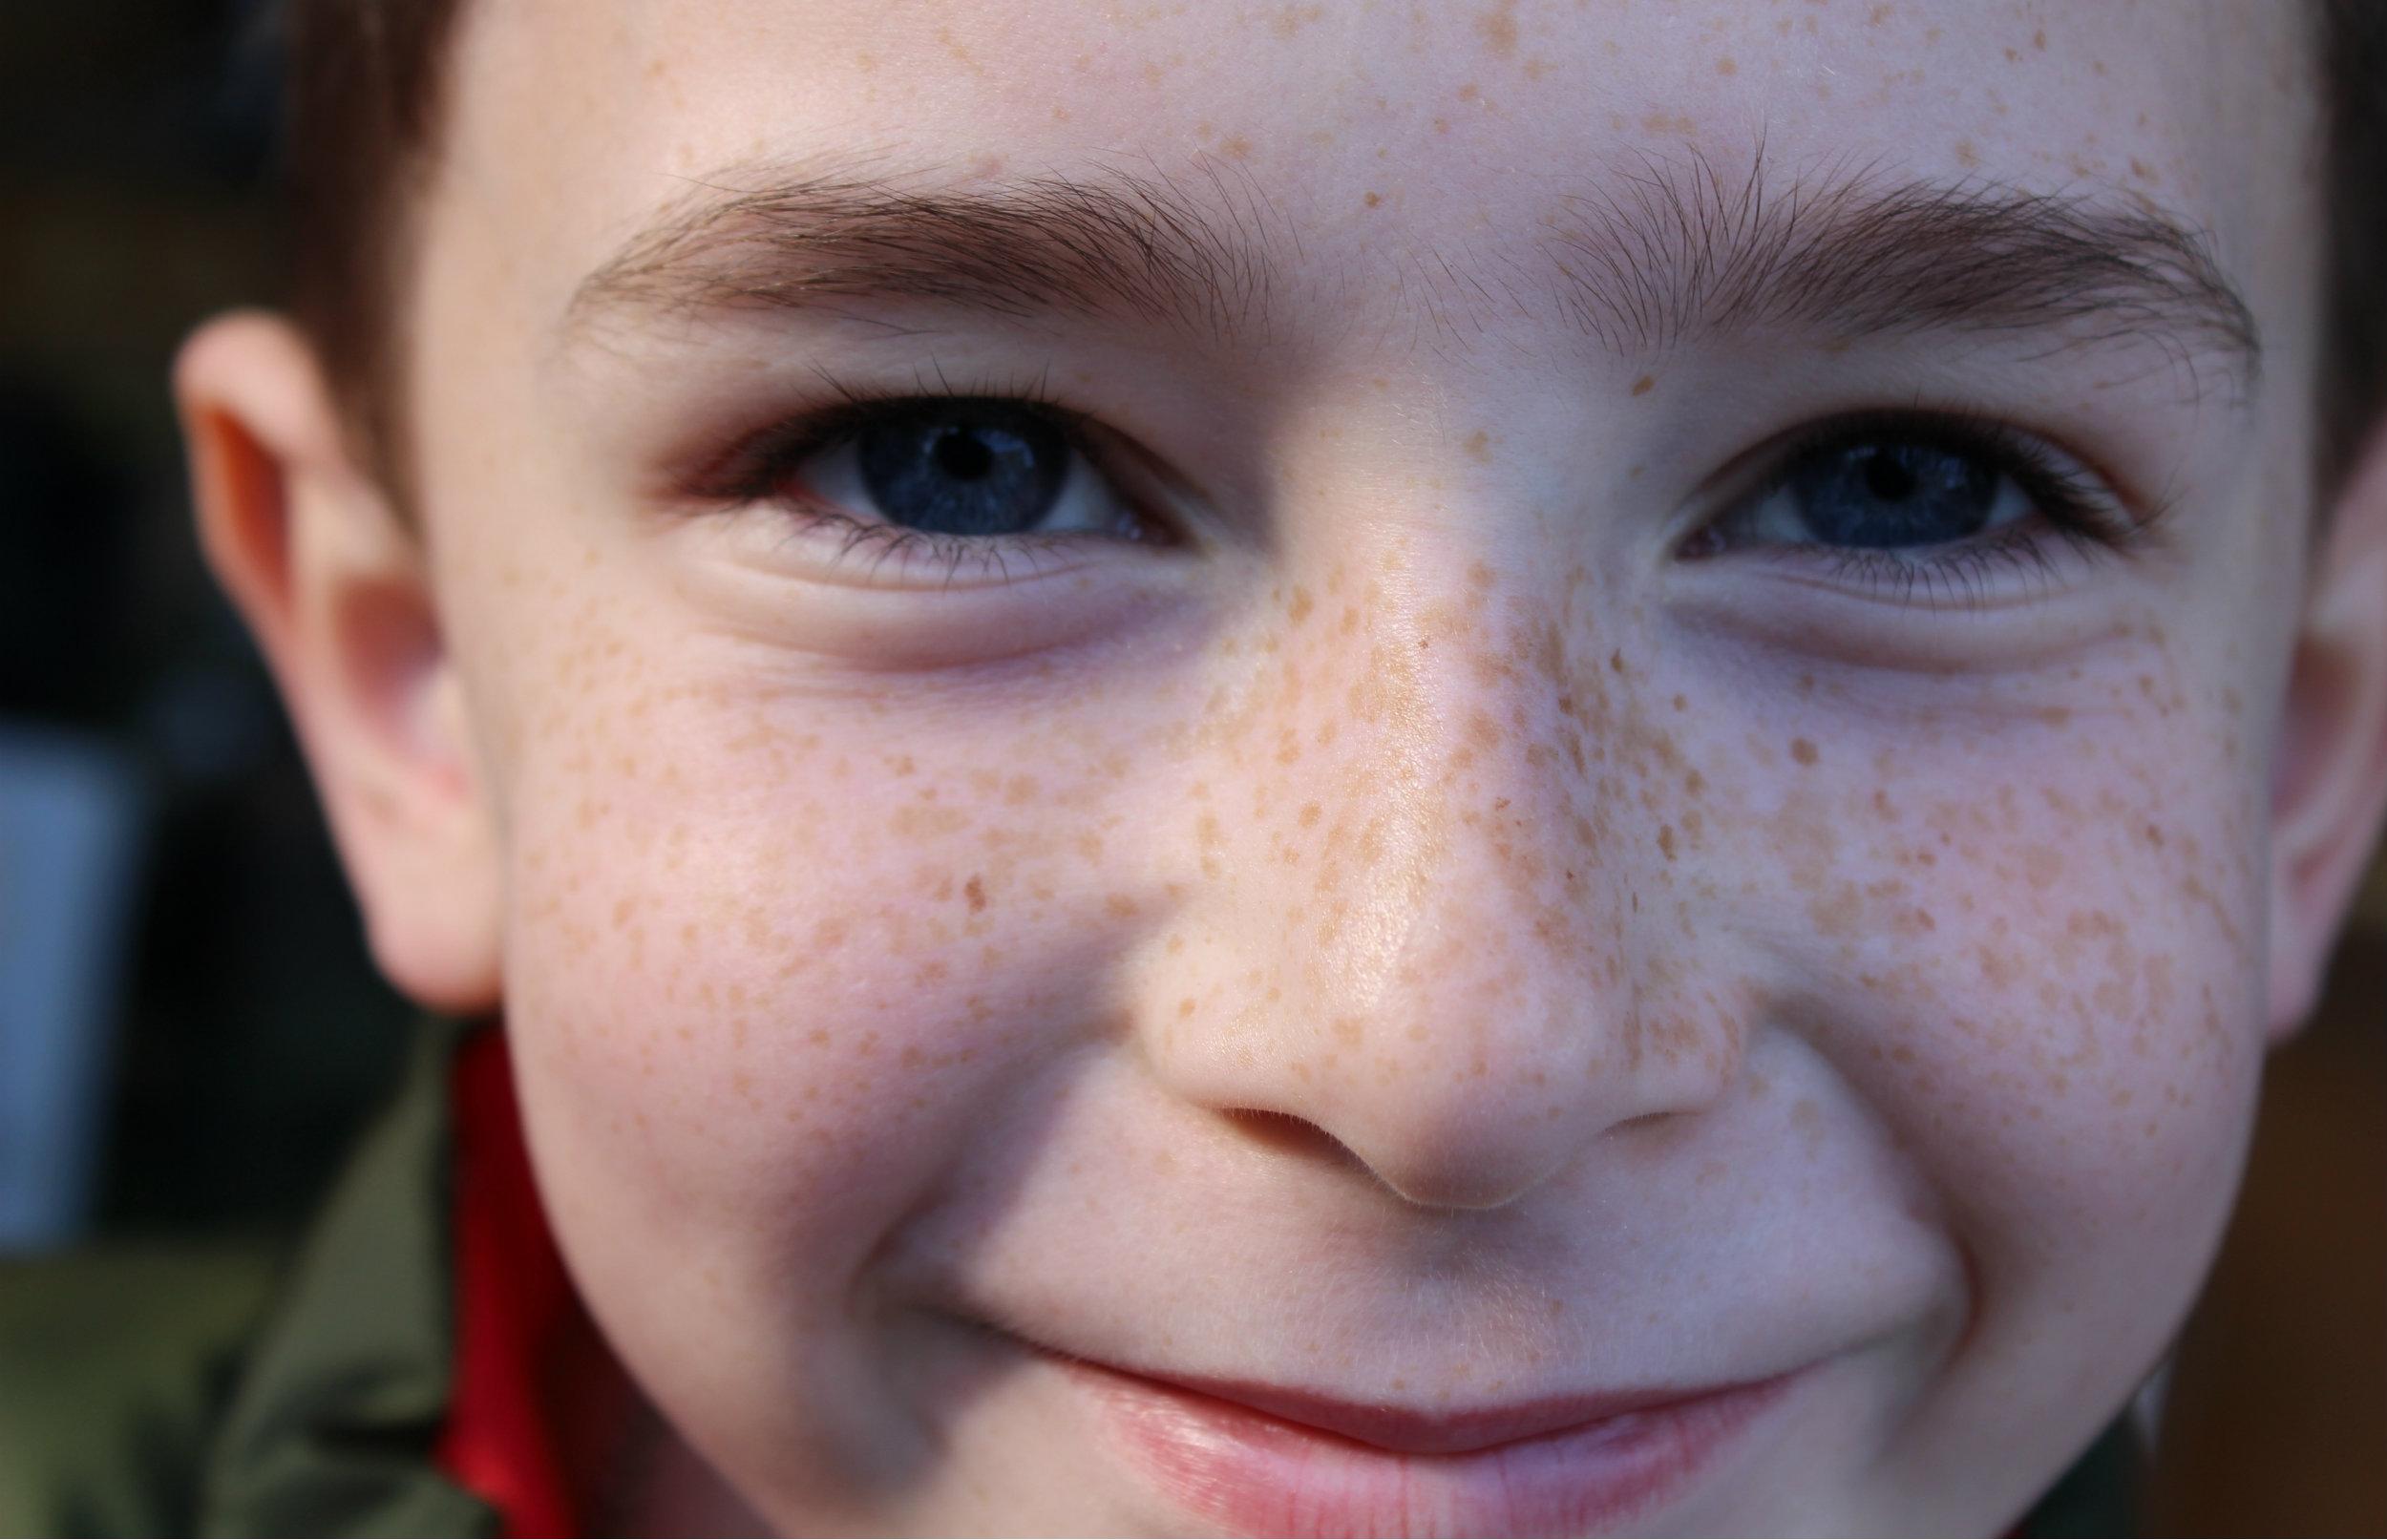 Børn mangler natur-vitaminer